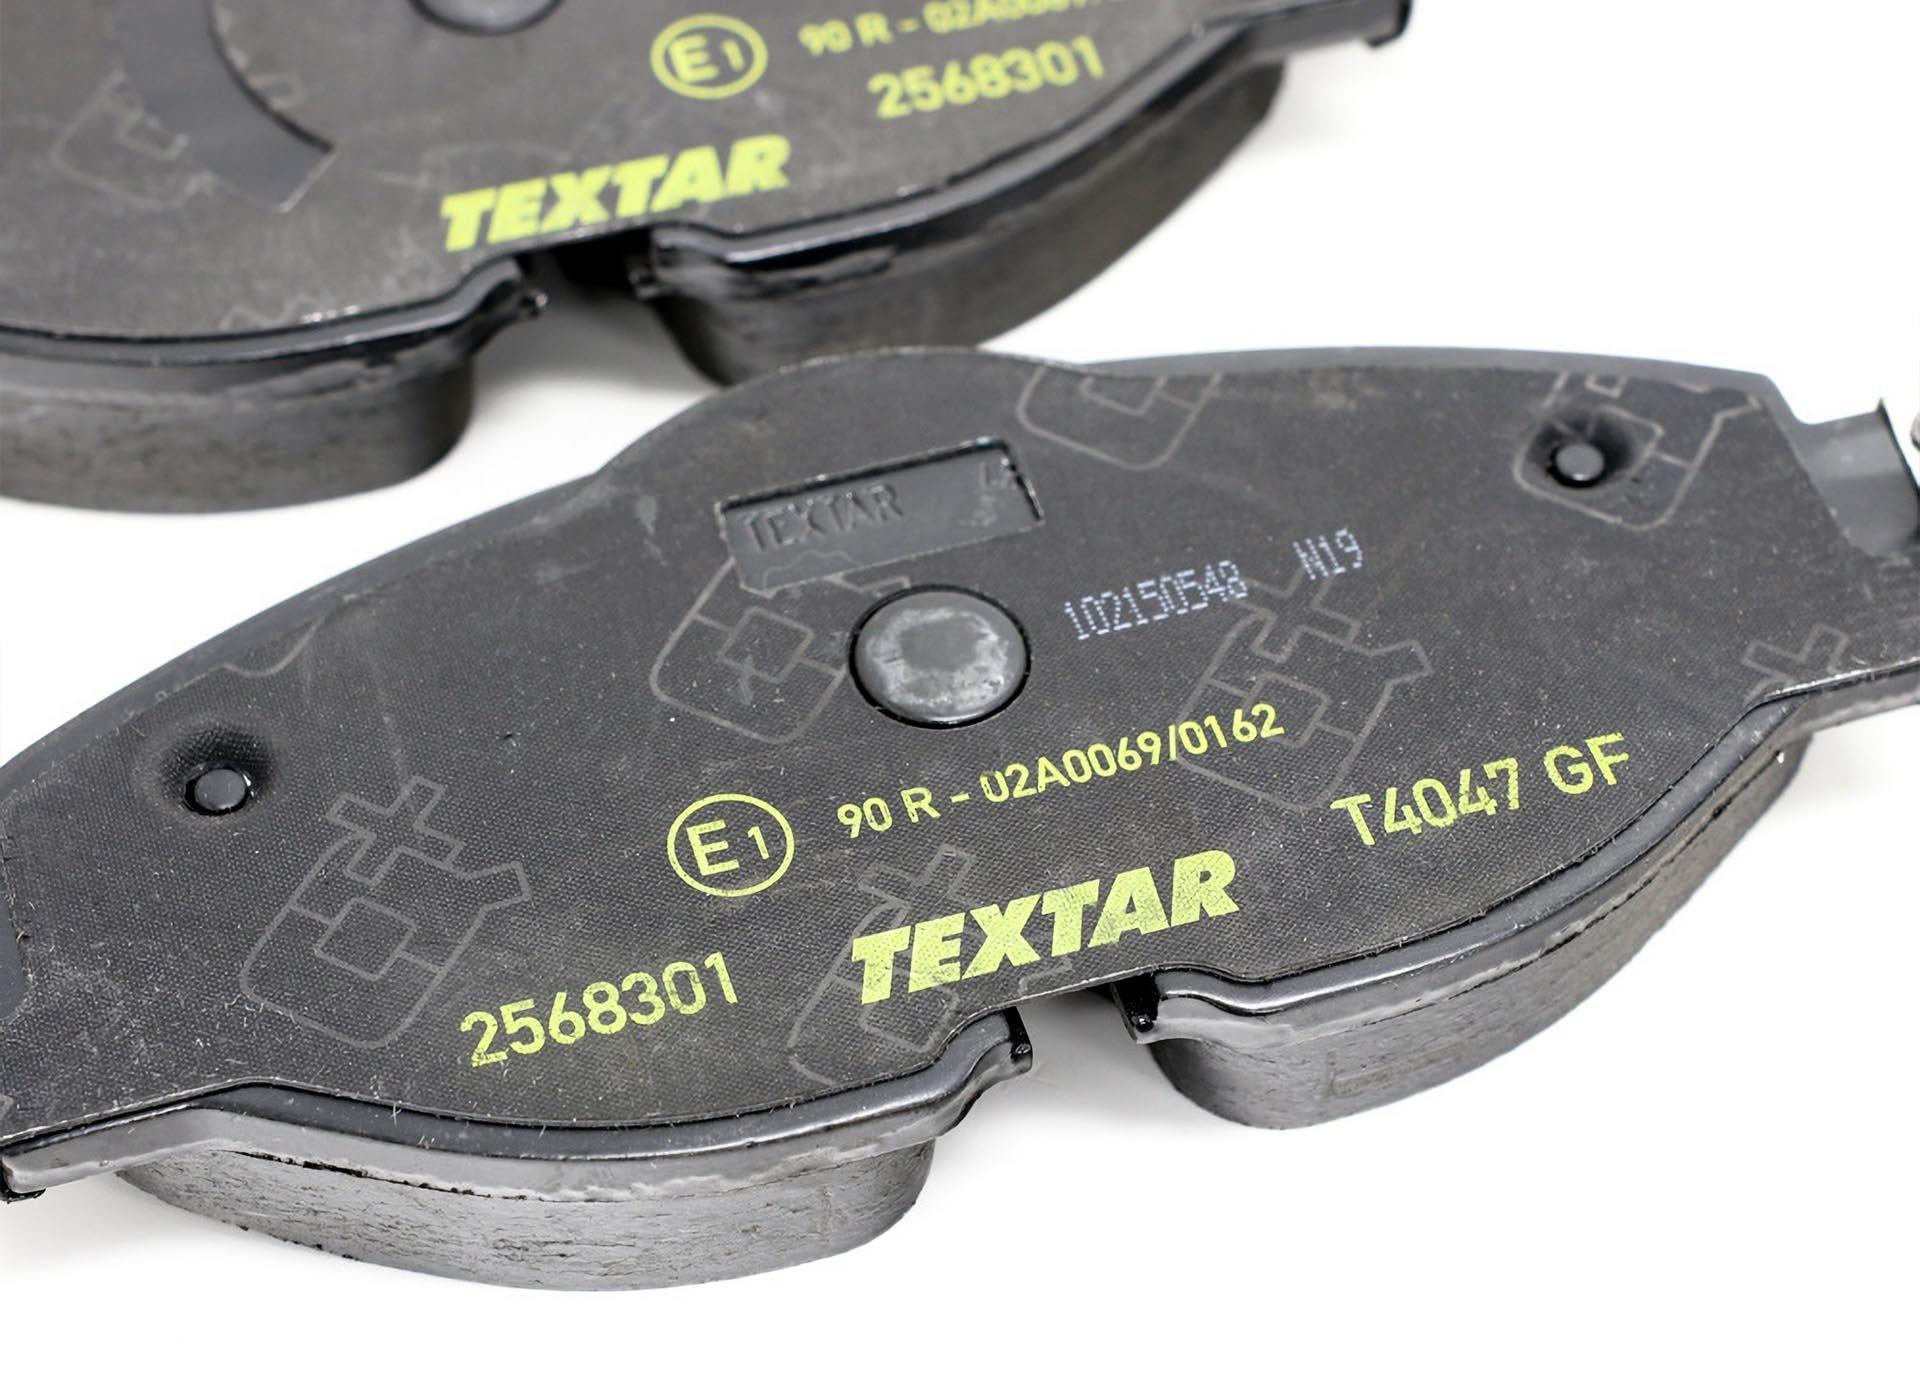 01.5Textar Q+ brake pades